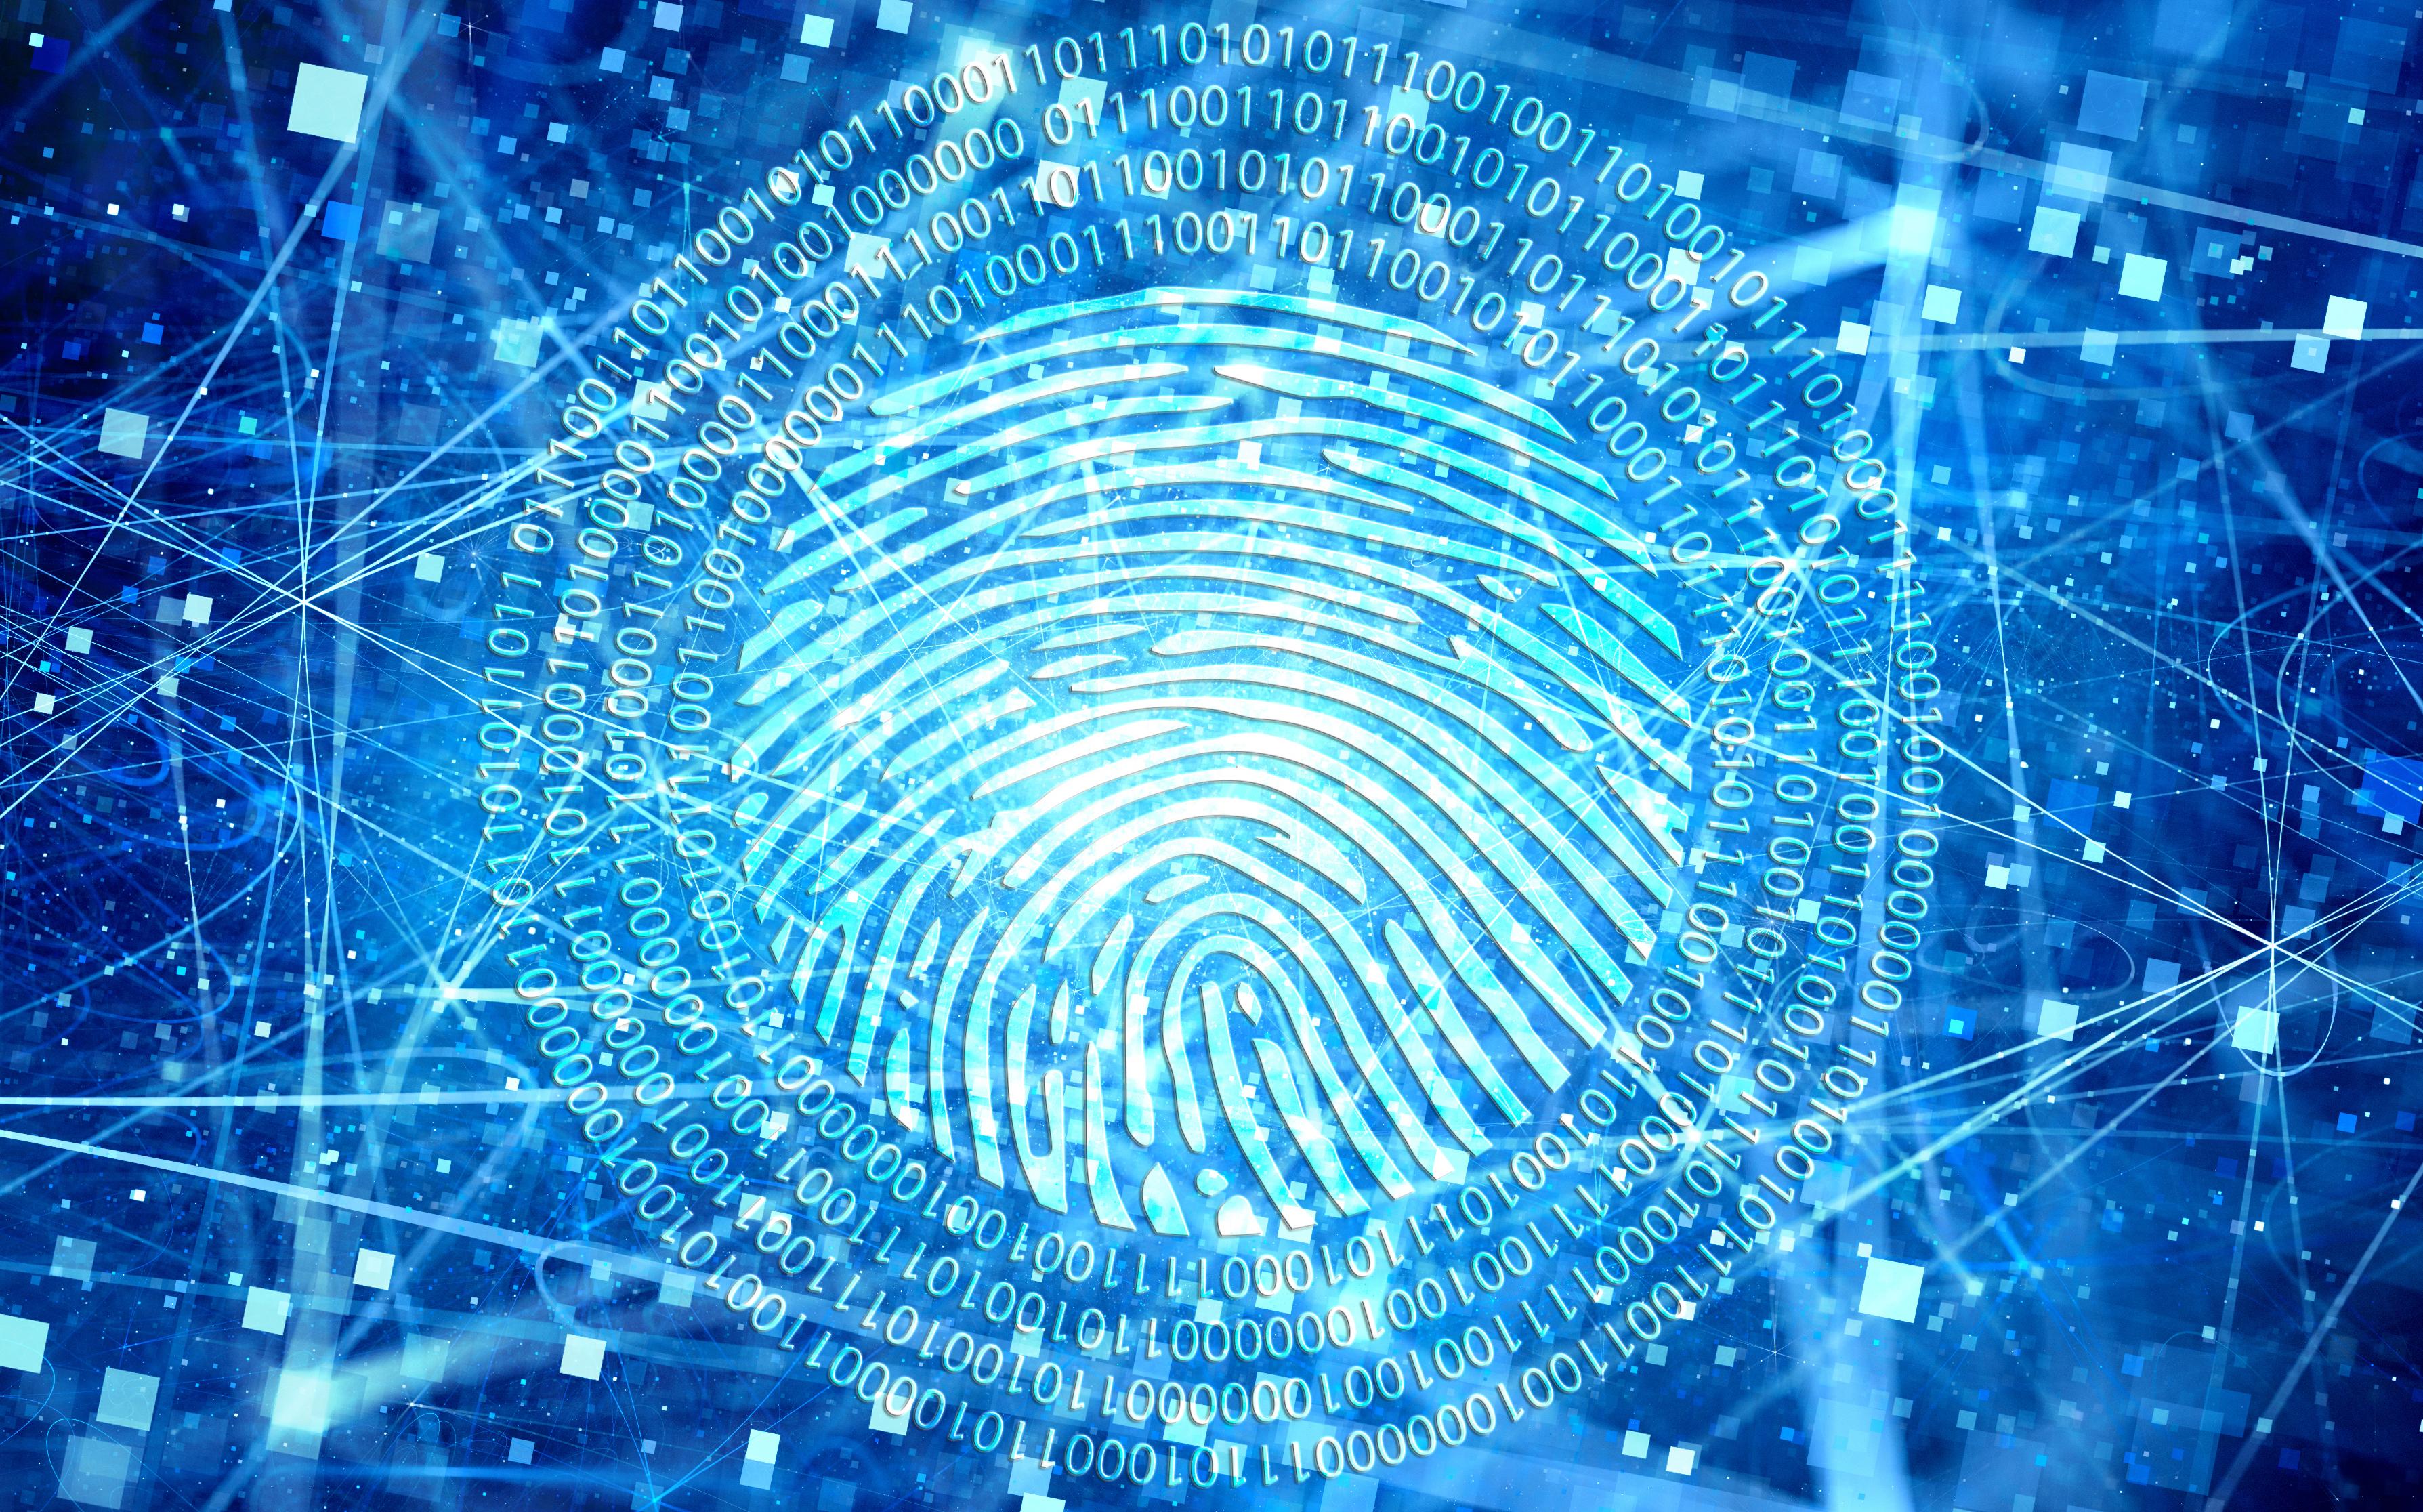 Illustration of digital fingerprint surrounding by 1s and 0s